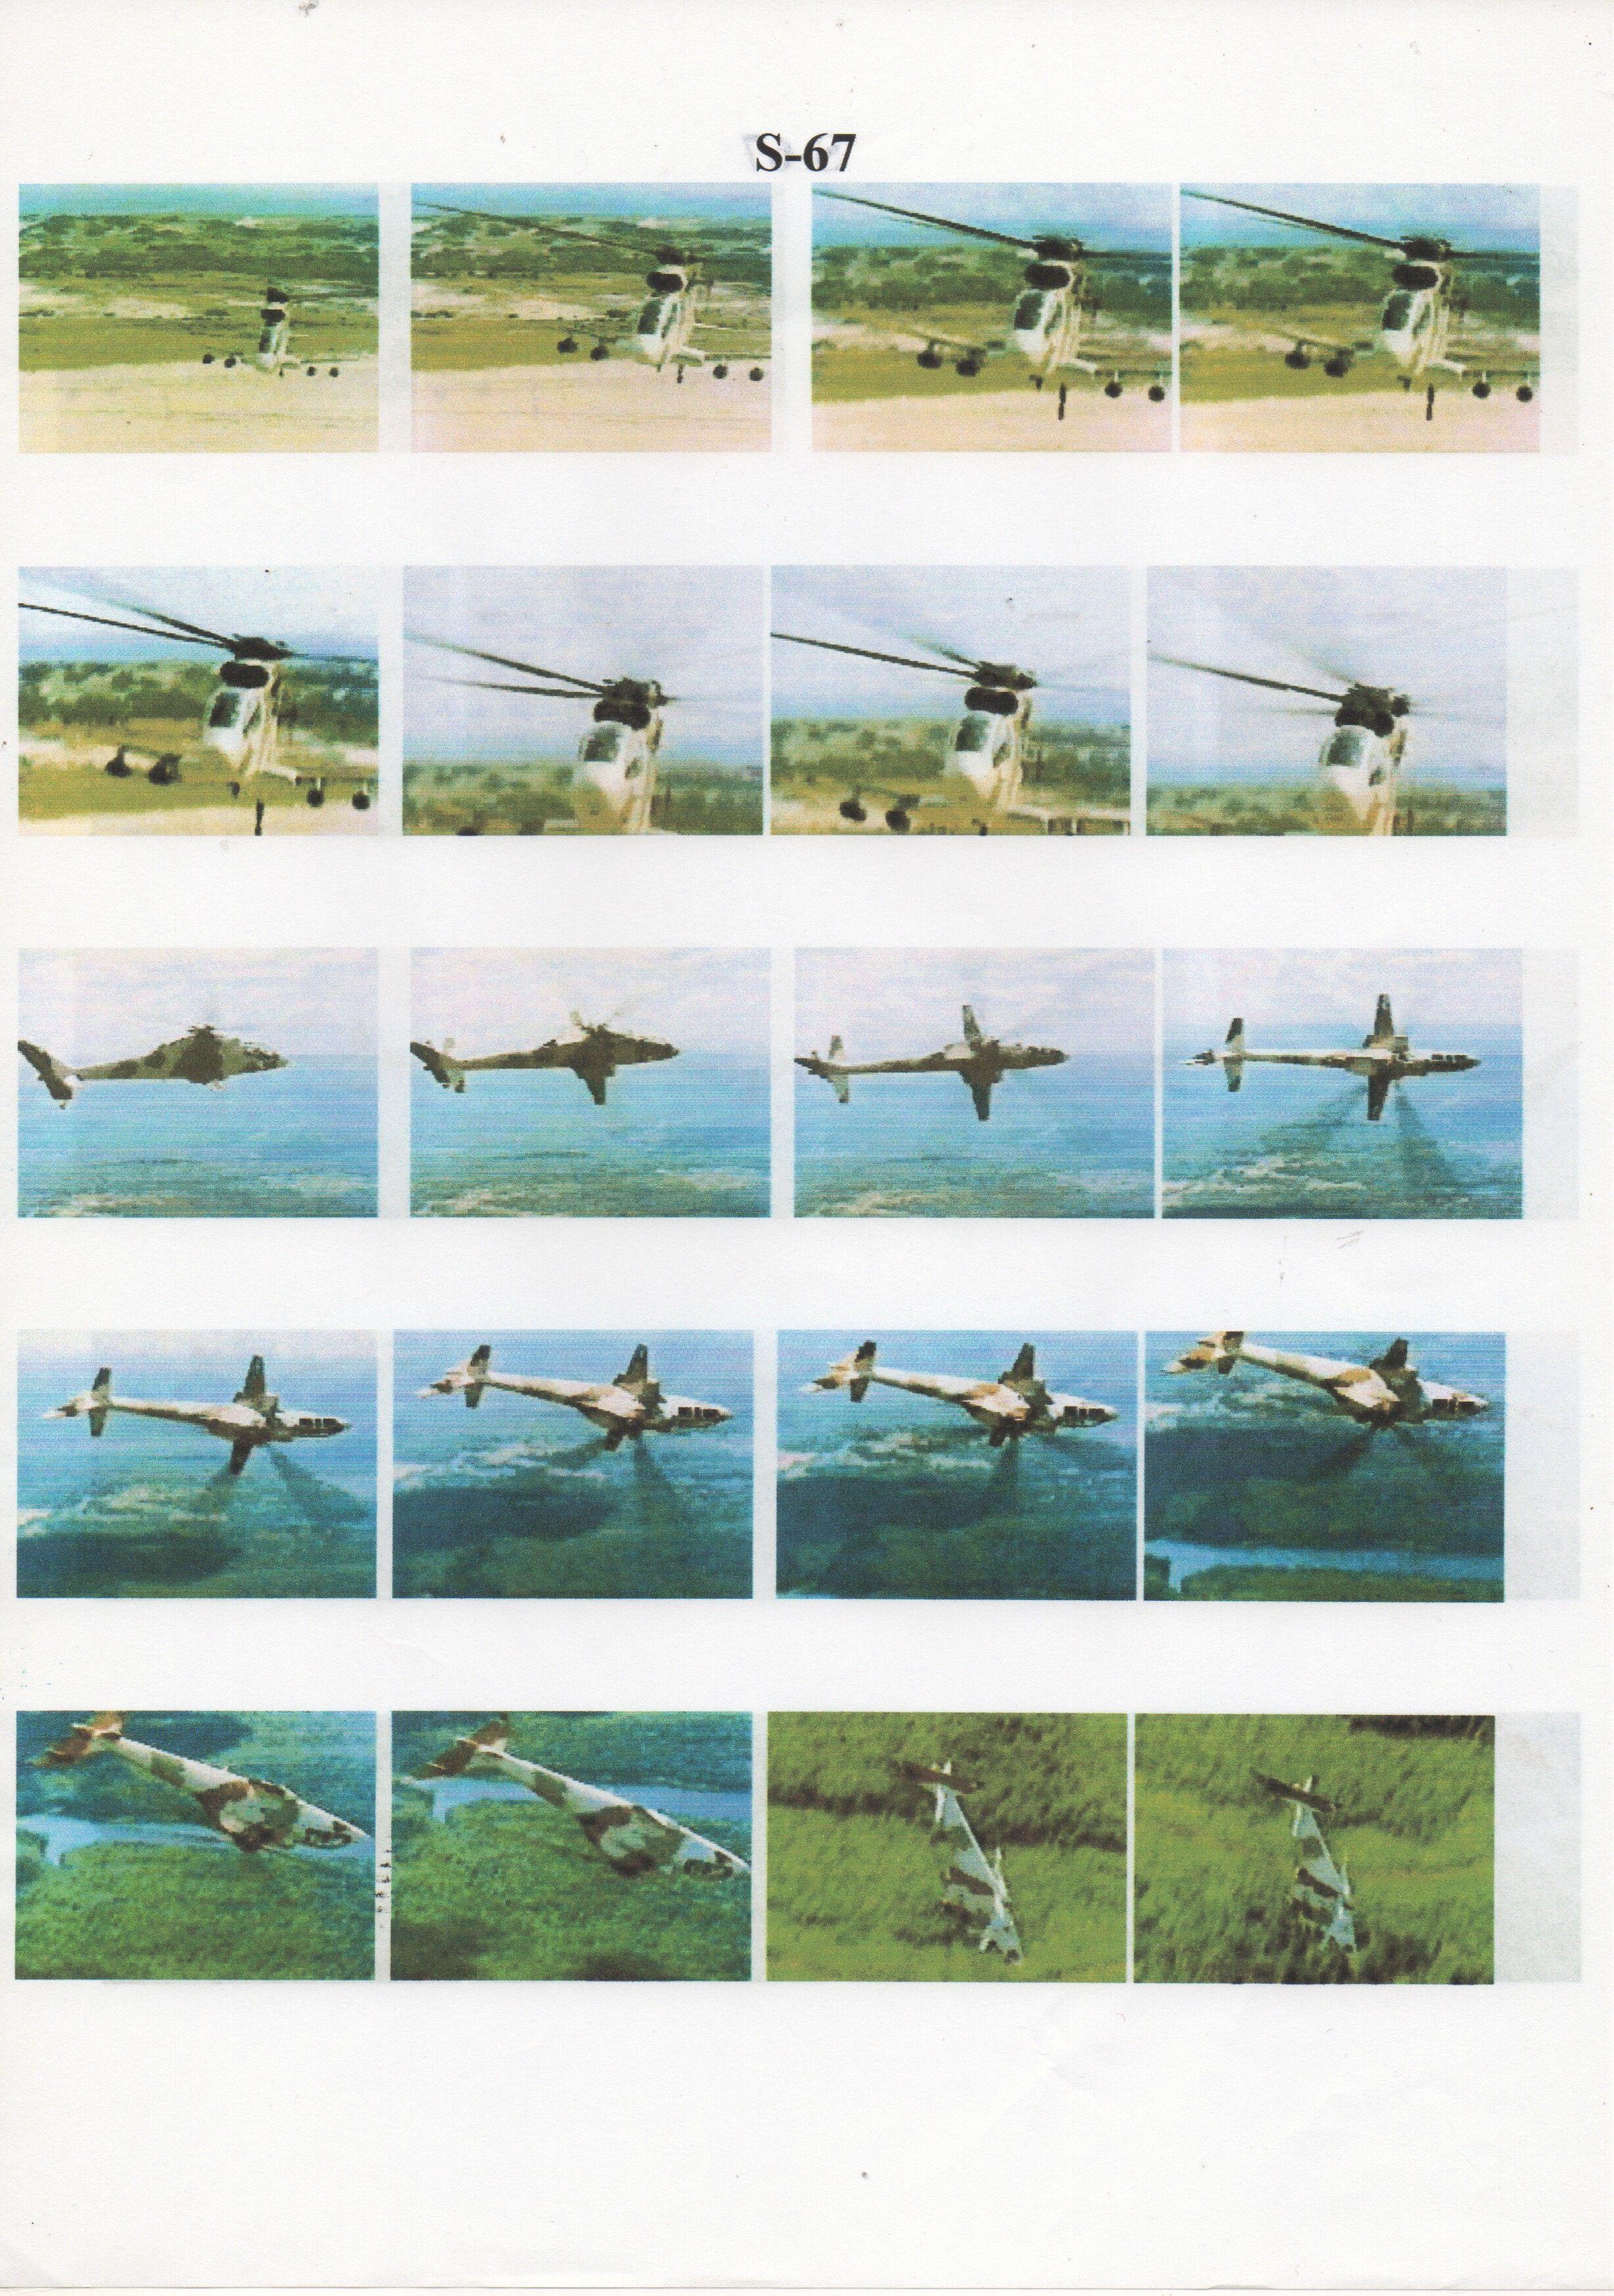 Sikorsky S 67 Blackhawk Usa War Thunder Official Forum Imo S67 7ccbac708876b902a4eb4a35c19ec6a8